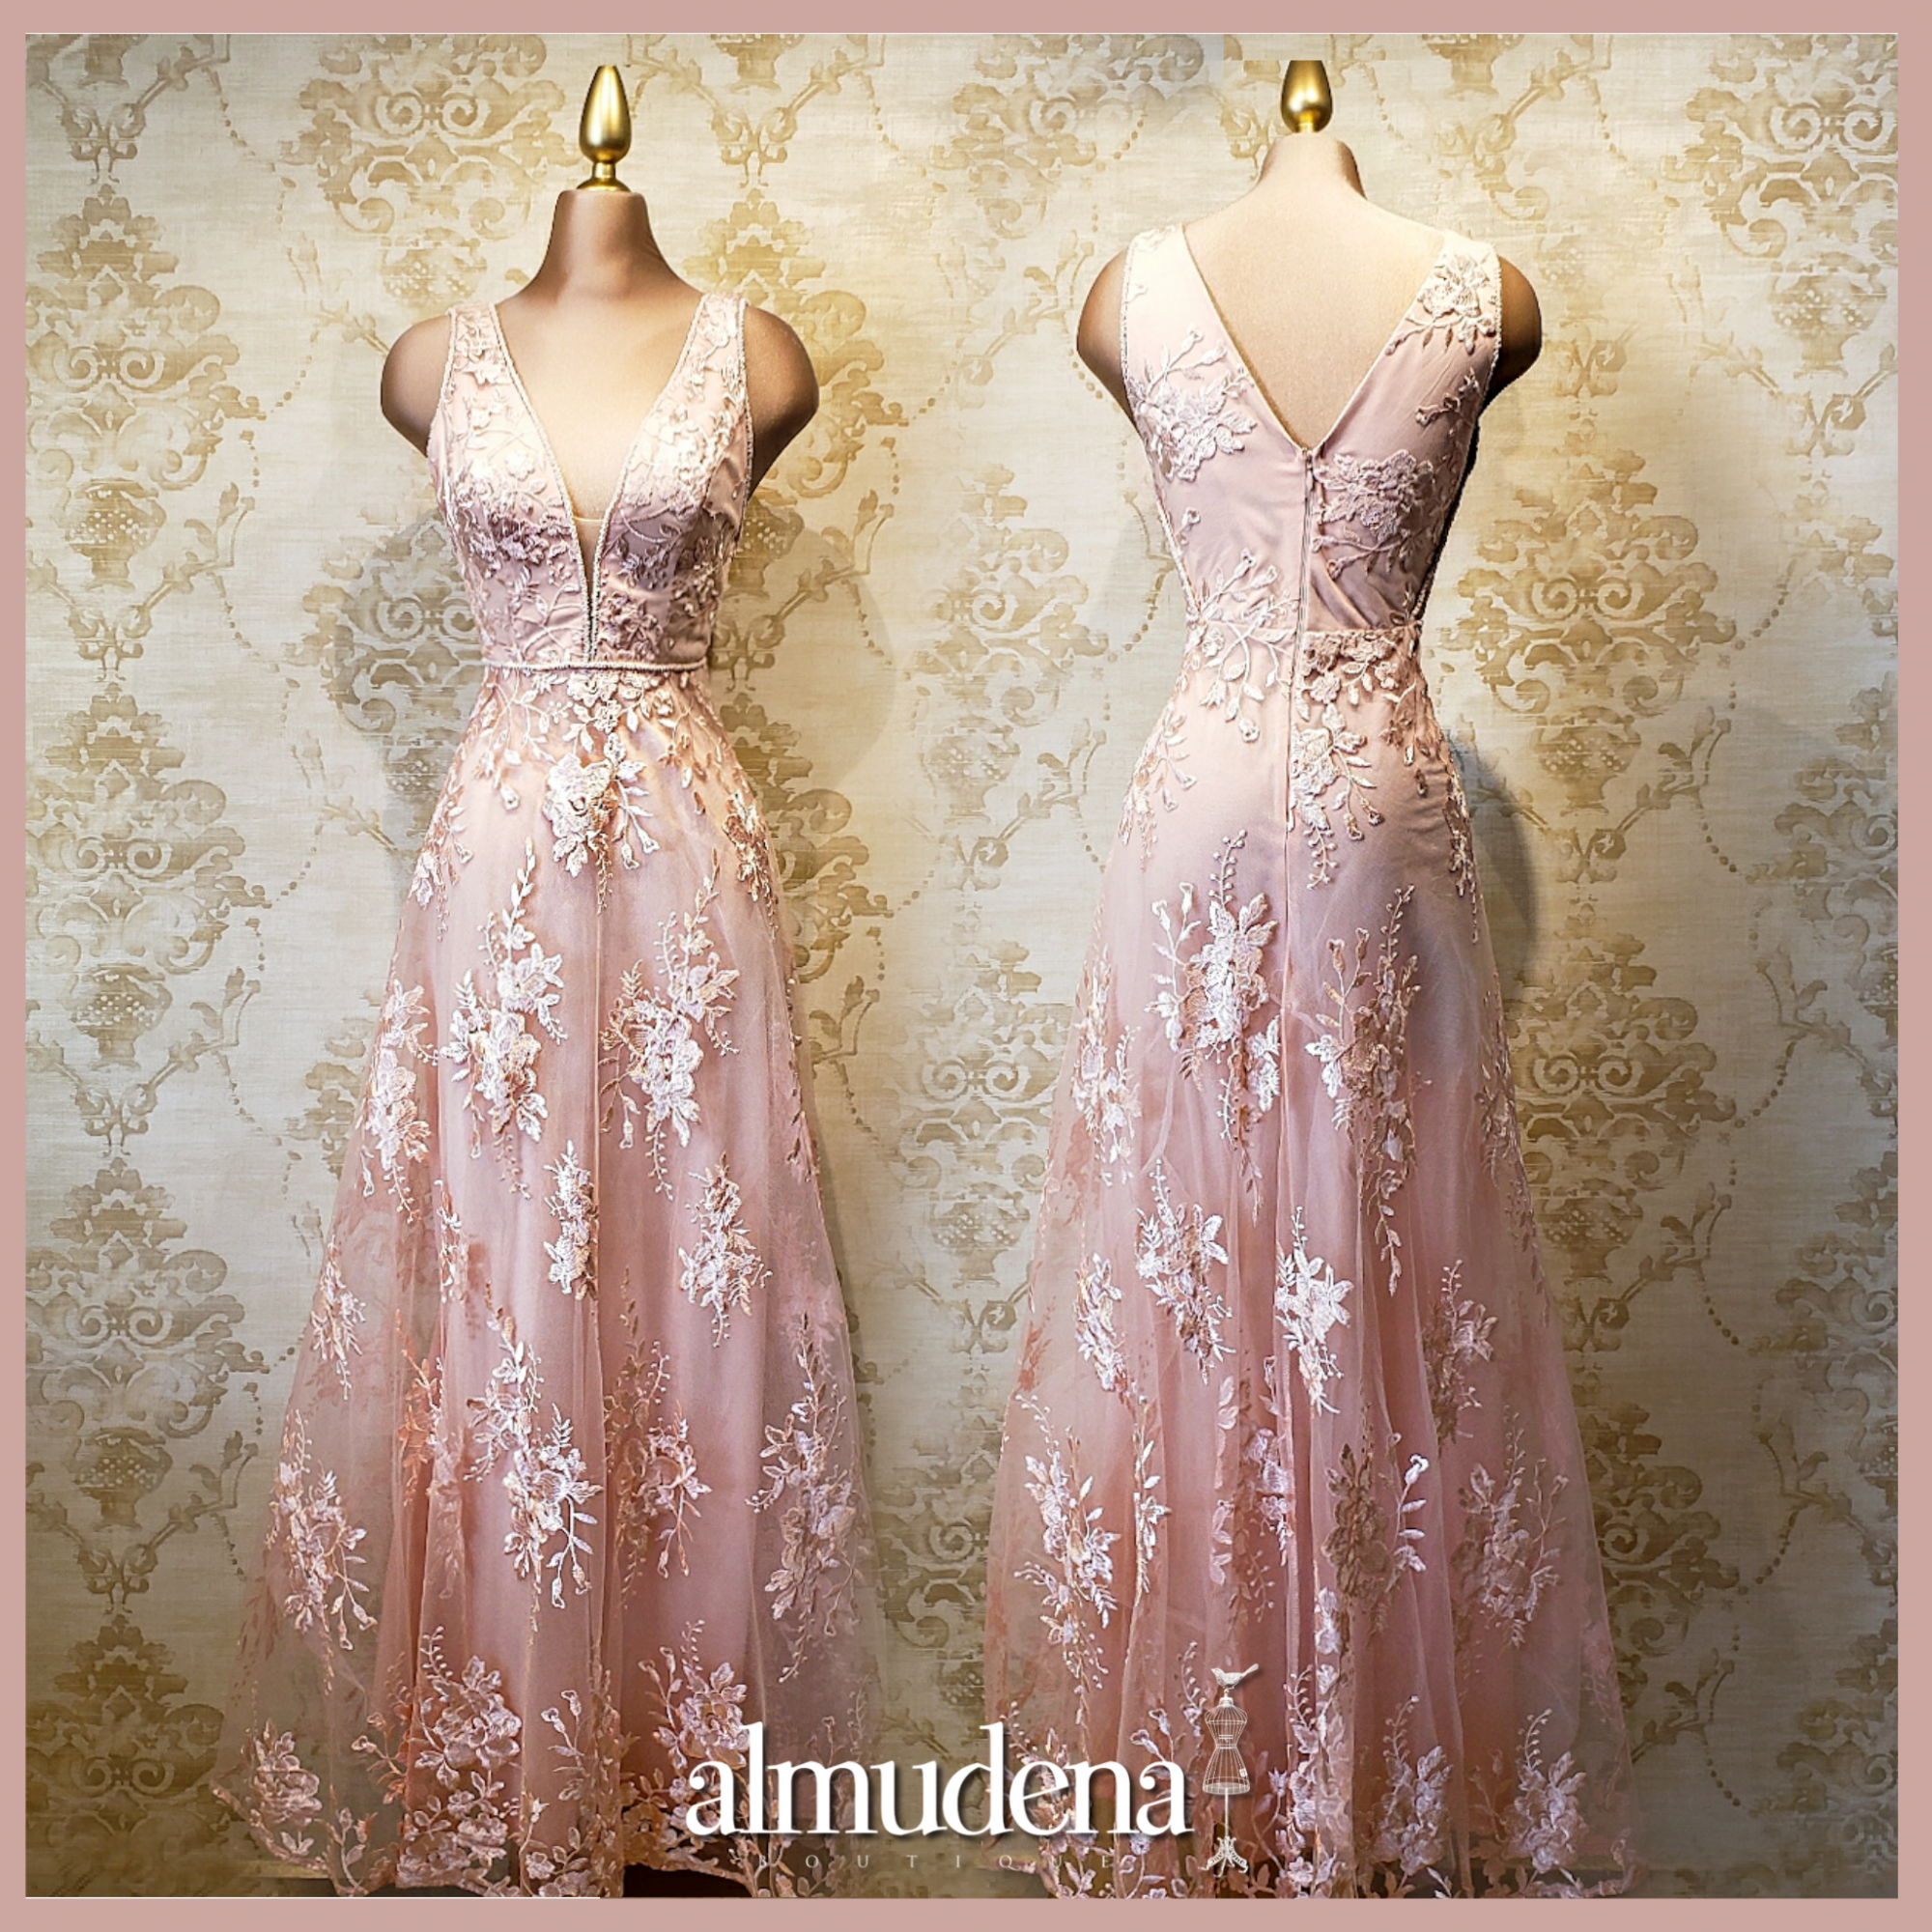 vestido rosa encaje largo boda dia playa noche